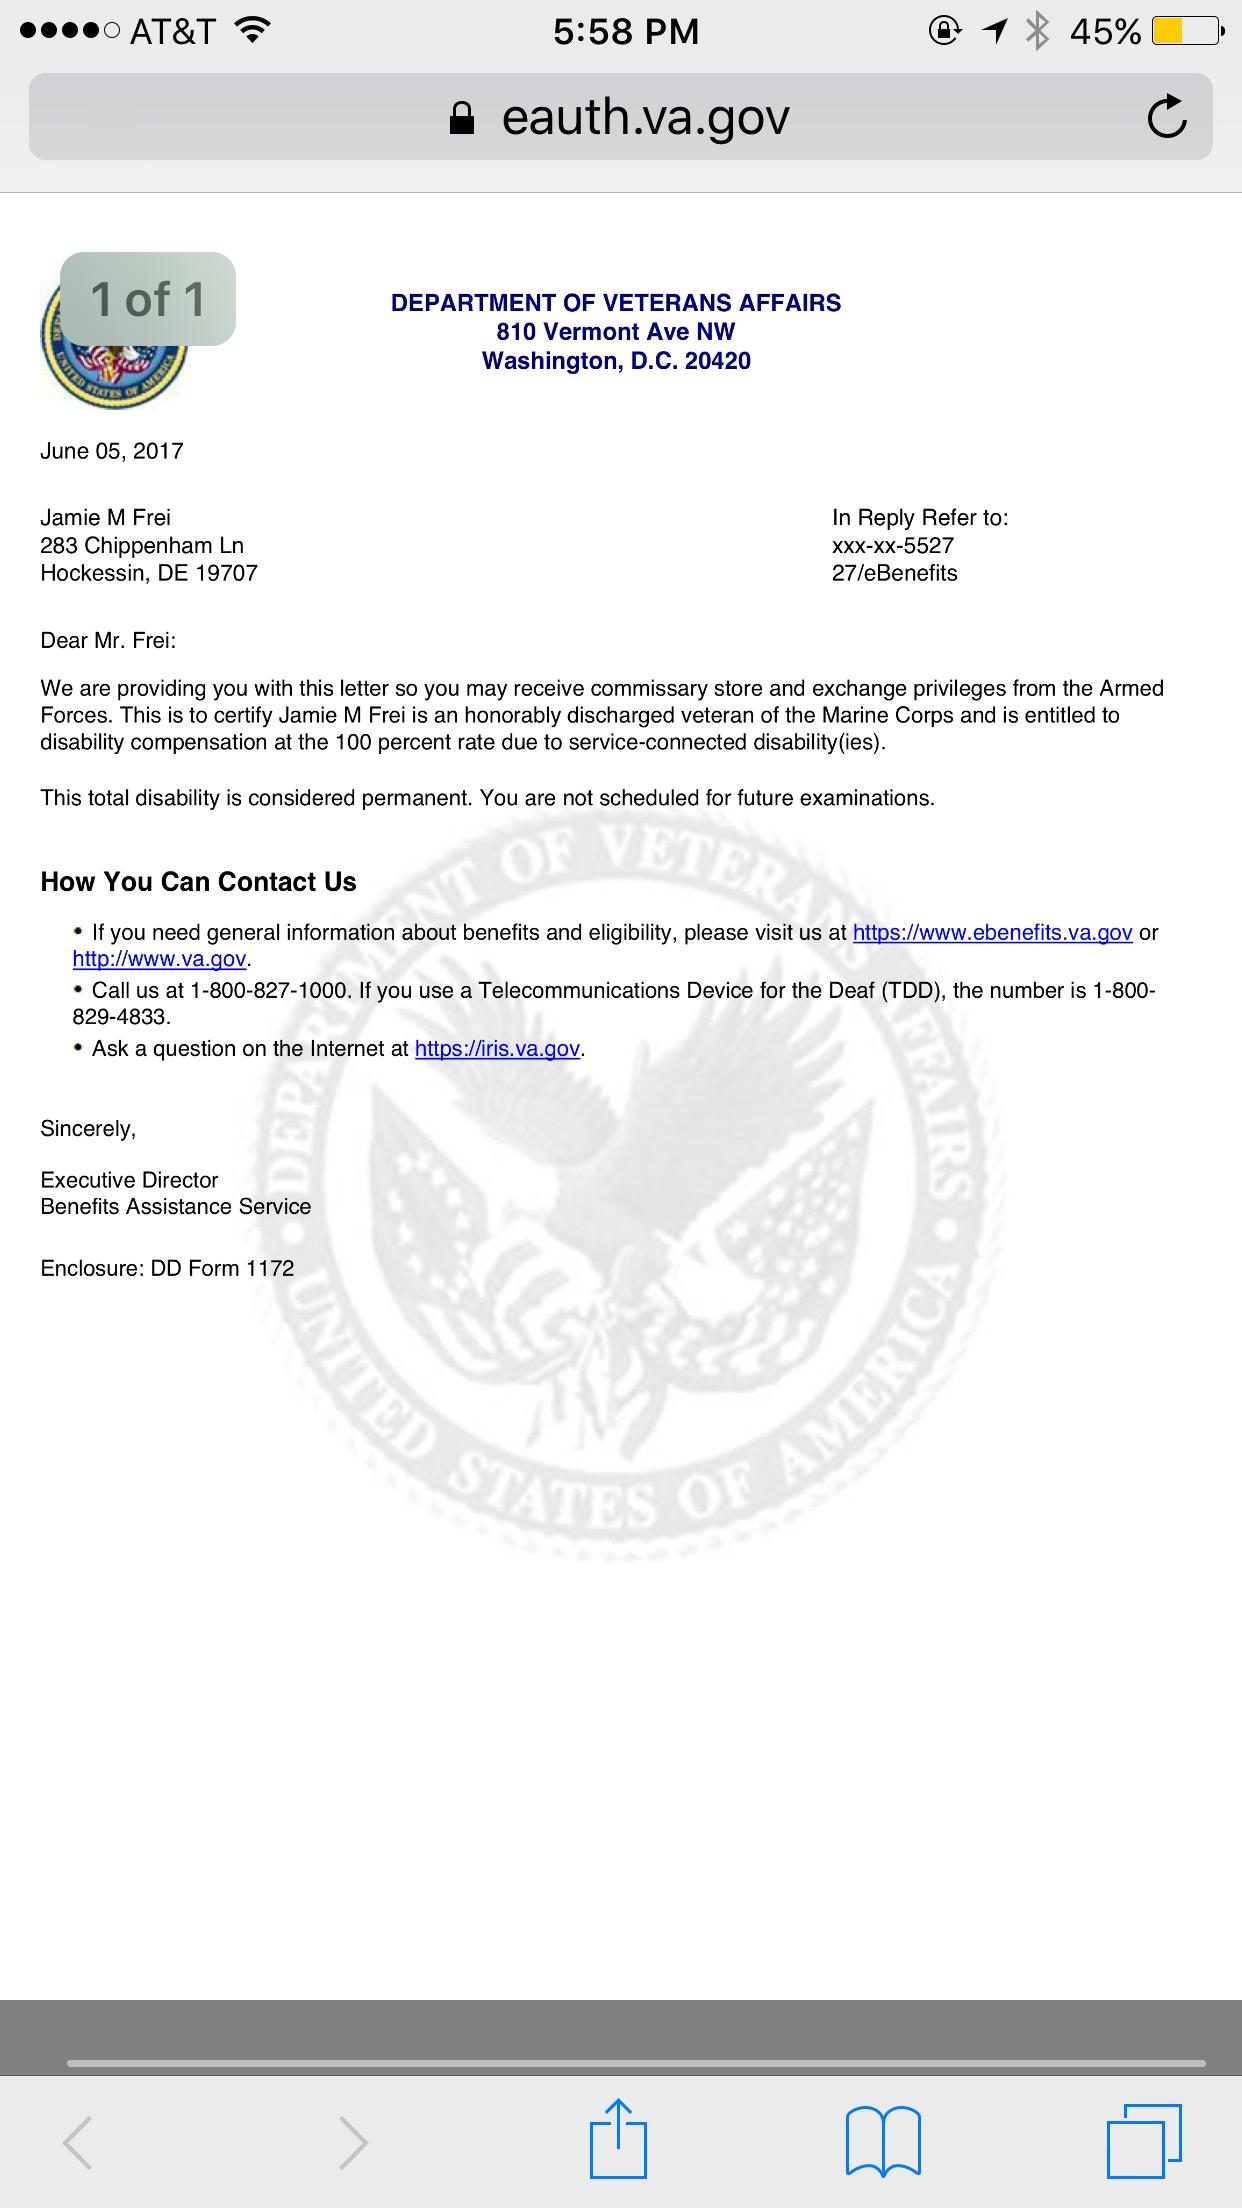 DBQ Chronic Adjustment disorder - Veterans Compensation & Pension